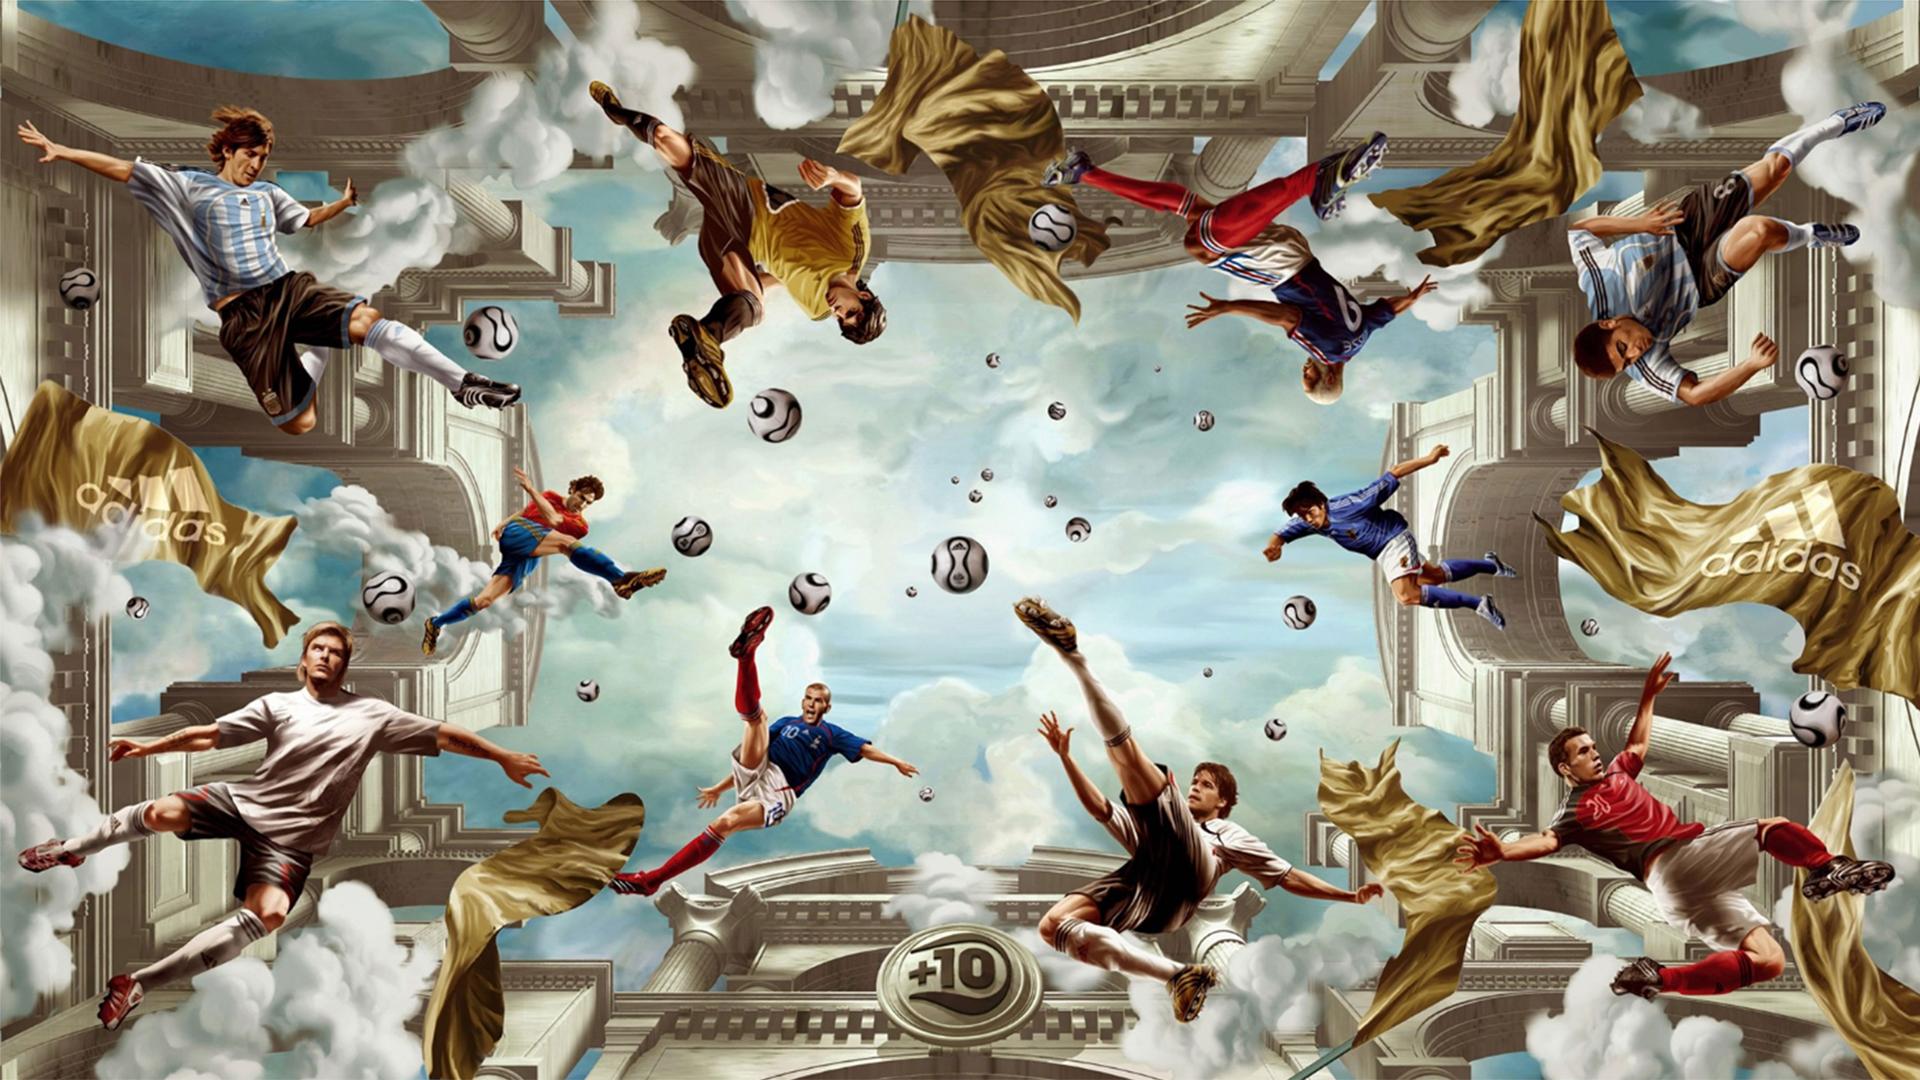 10 obras de arte relacionadas al fútbol - Infobae